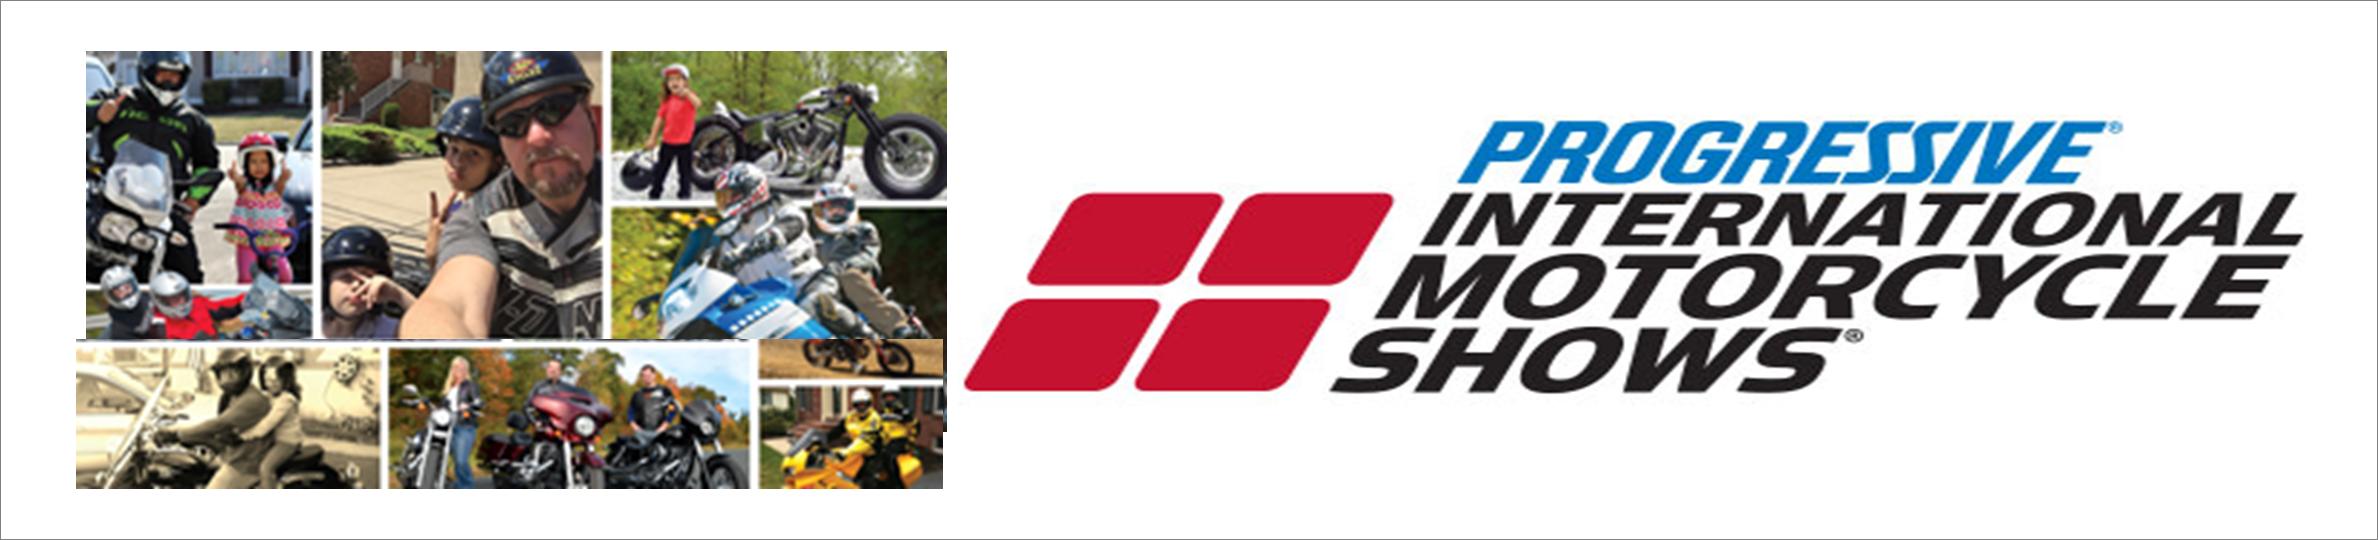 2015motorcycleshow0109201501-750xx4616-2597-0-216